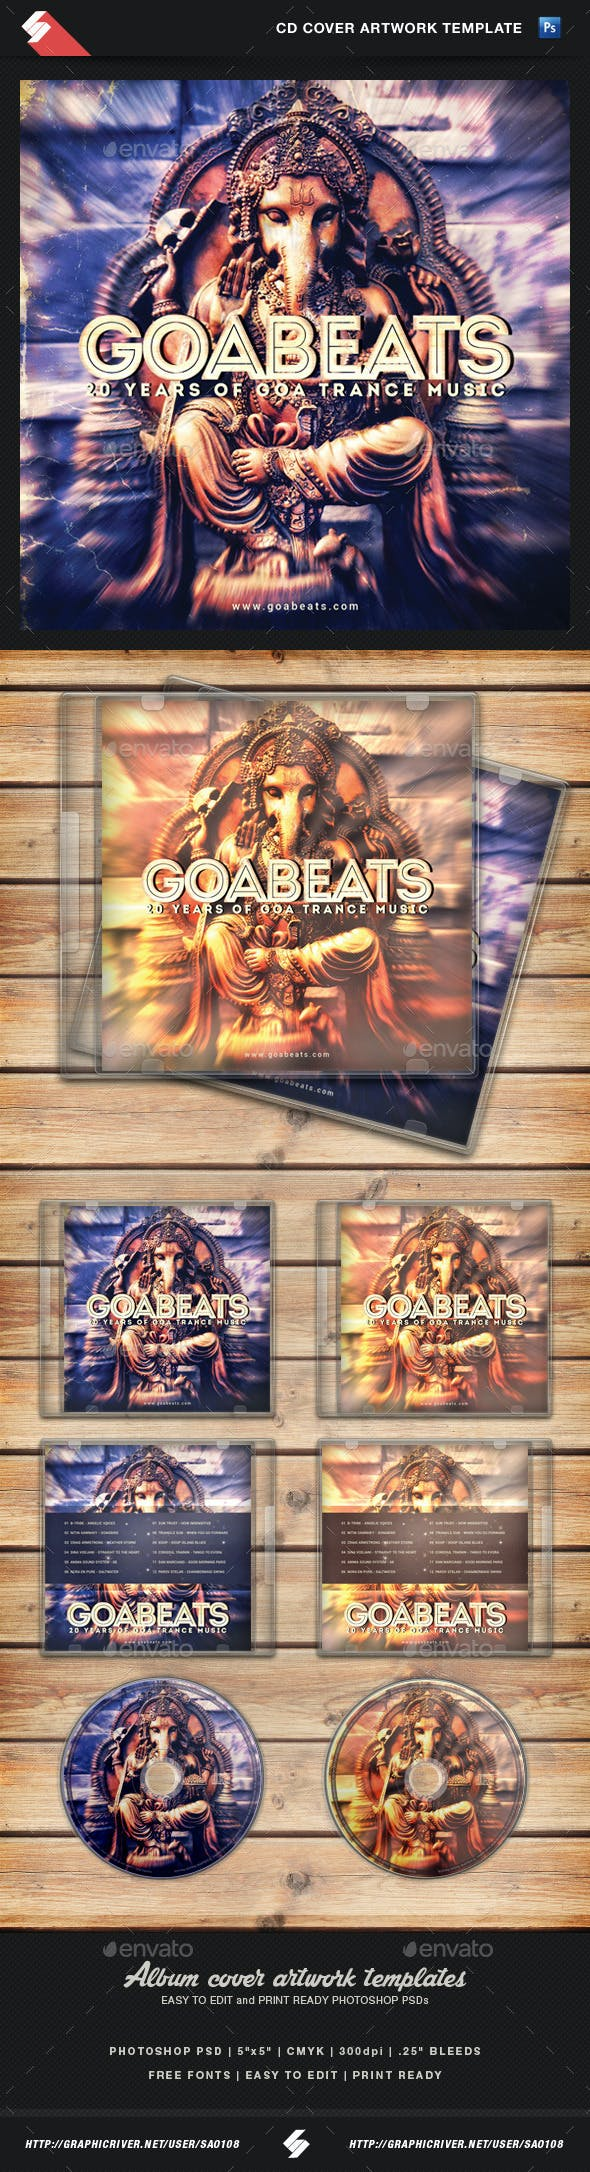 goa beats psytrance album cd cover template by sao108 graphicriver